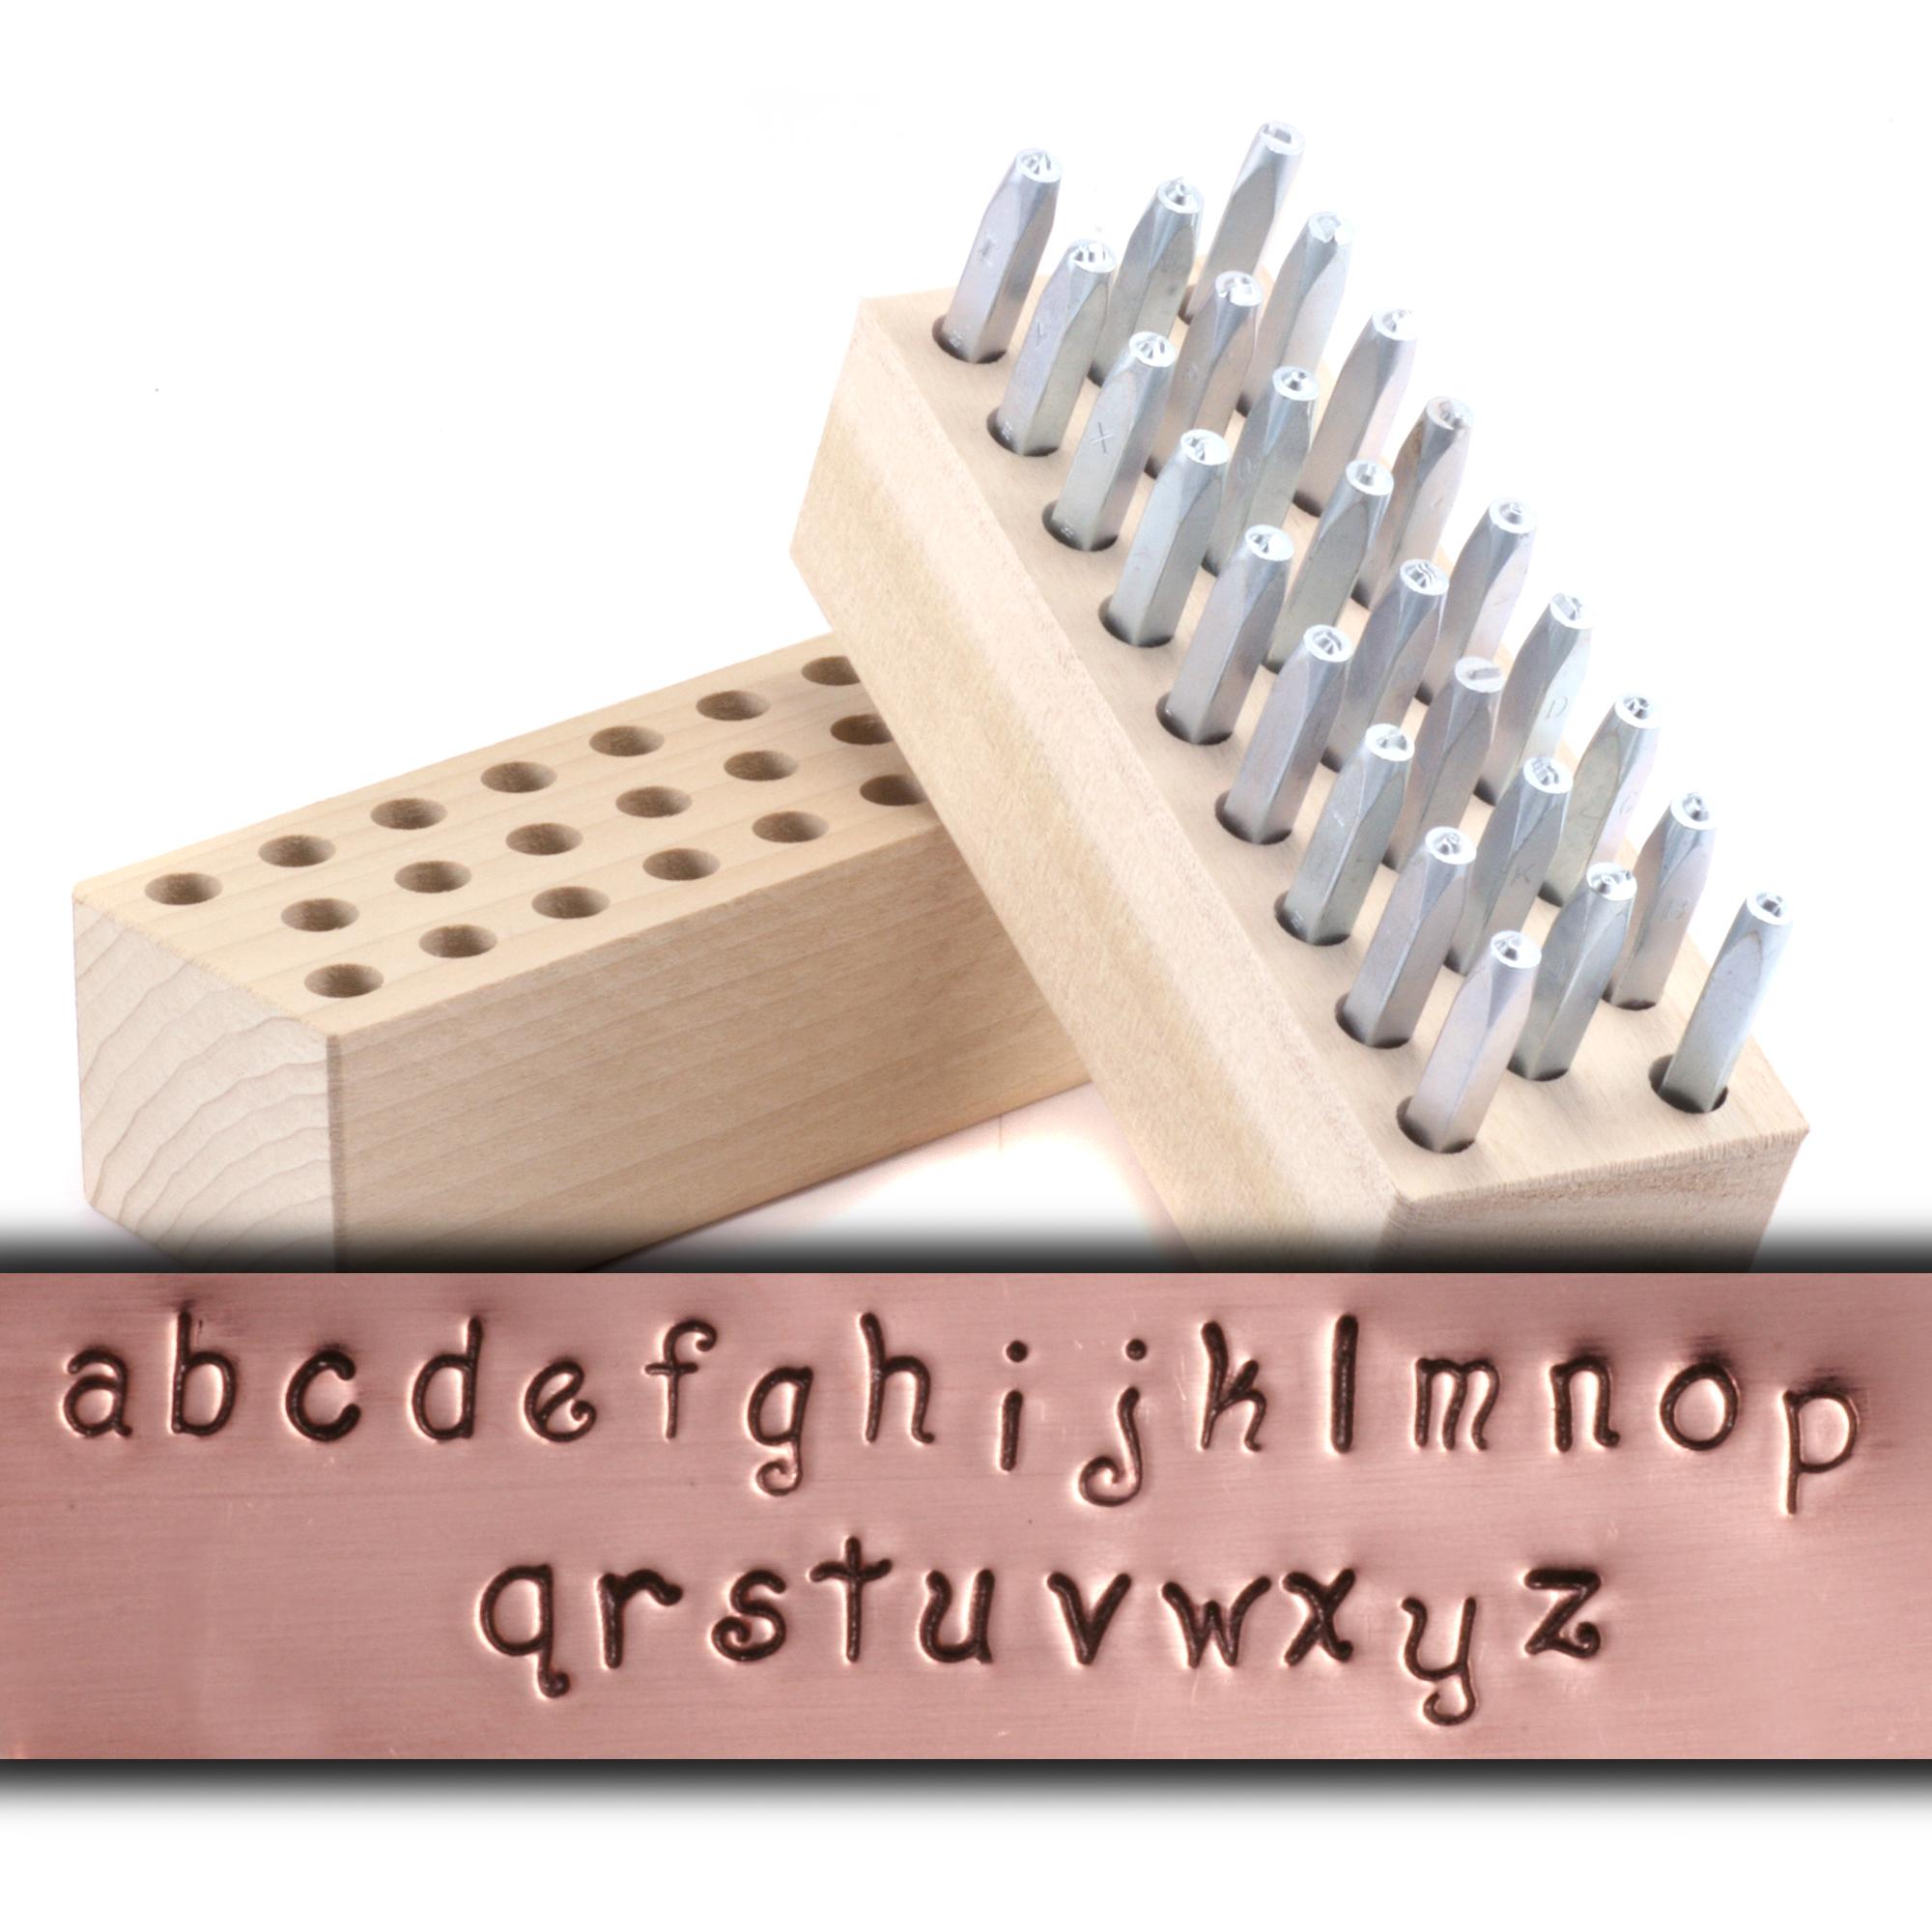 Metal Stamping Tools Beaducation Kismet Uppercase Letter Stamp Set 2mm